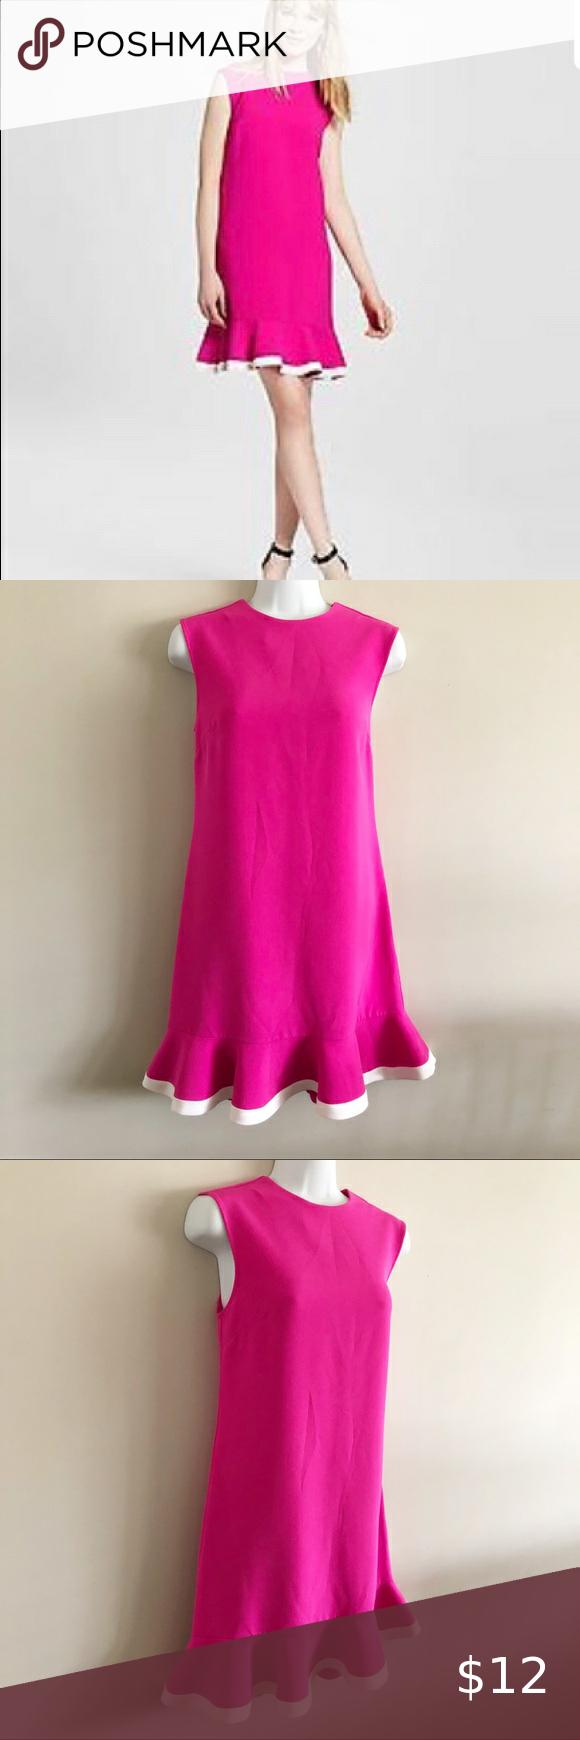 Victoria Beckham For Target Pink Dress In 2021 Victoria Beckham Target Pink Dress Victoria Beckham Dress [ 1740 x 580 Pixel ]